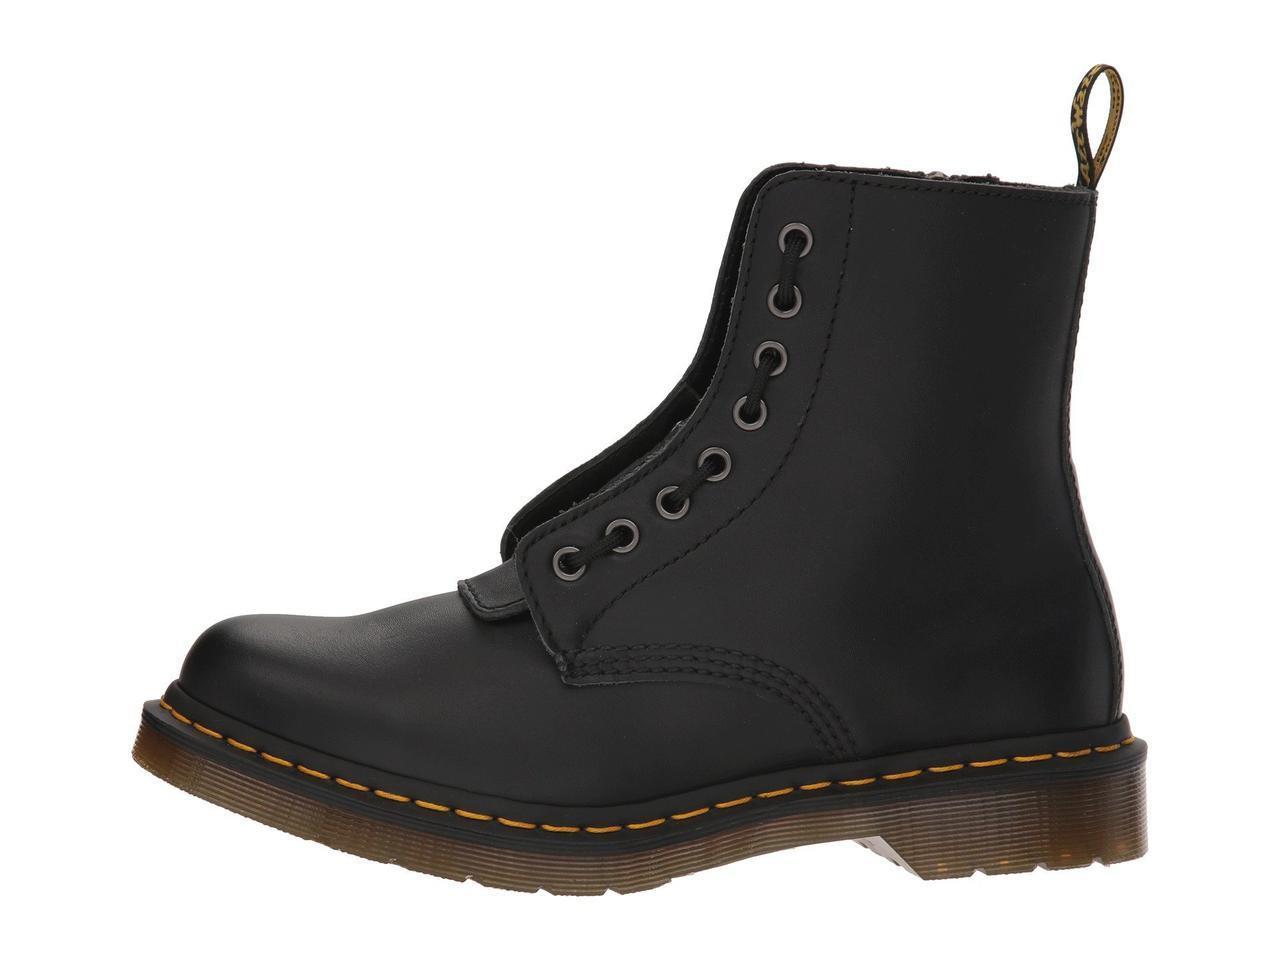 ... Ботинки Сапоги (Оригинал) Dr. Martens 1460 Pascal Front Zip Black  Nappa 3ba16762016b9